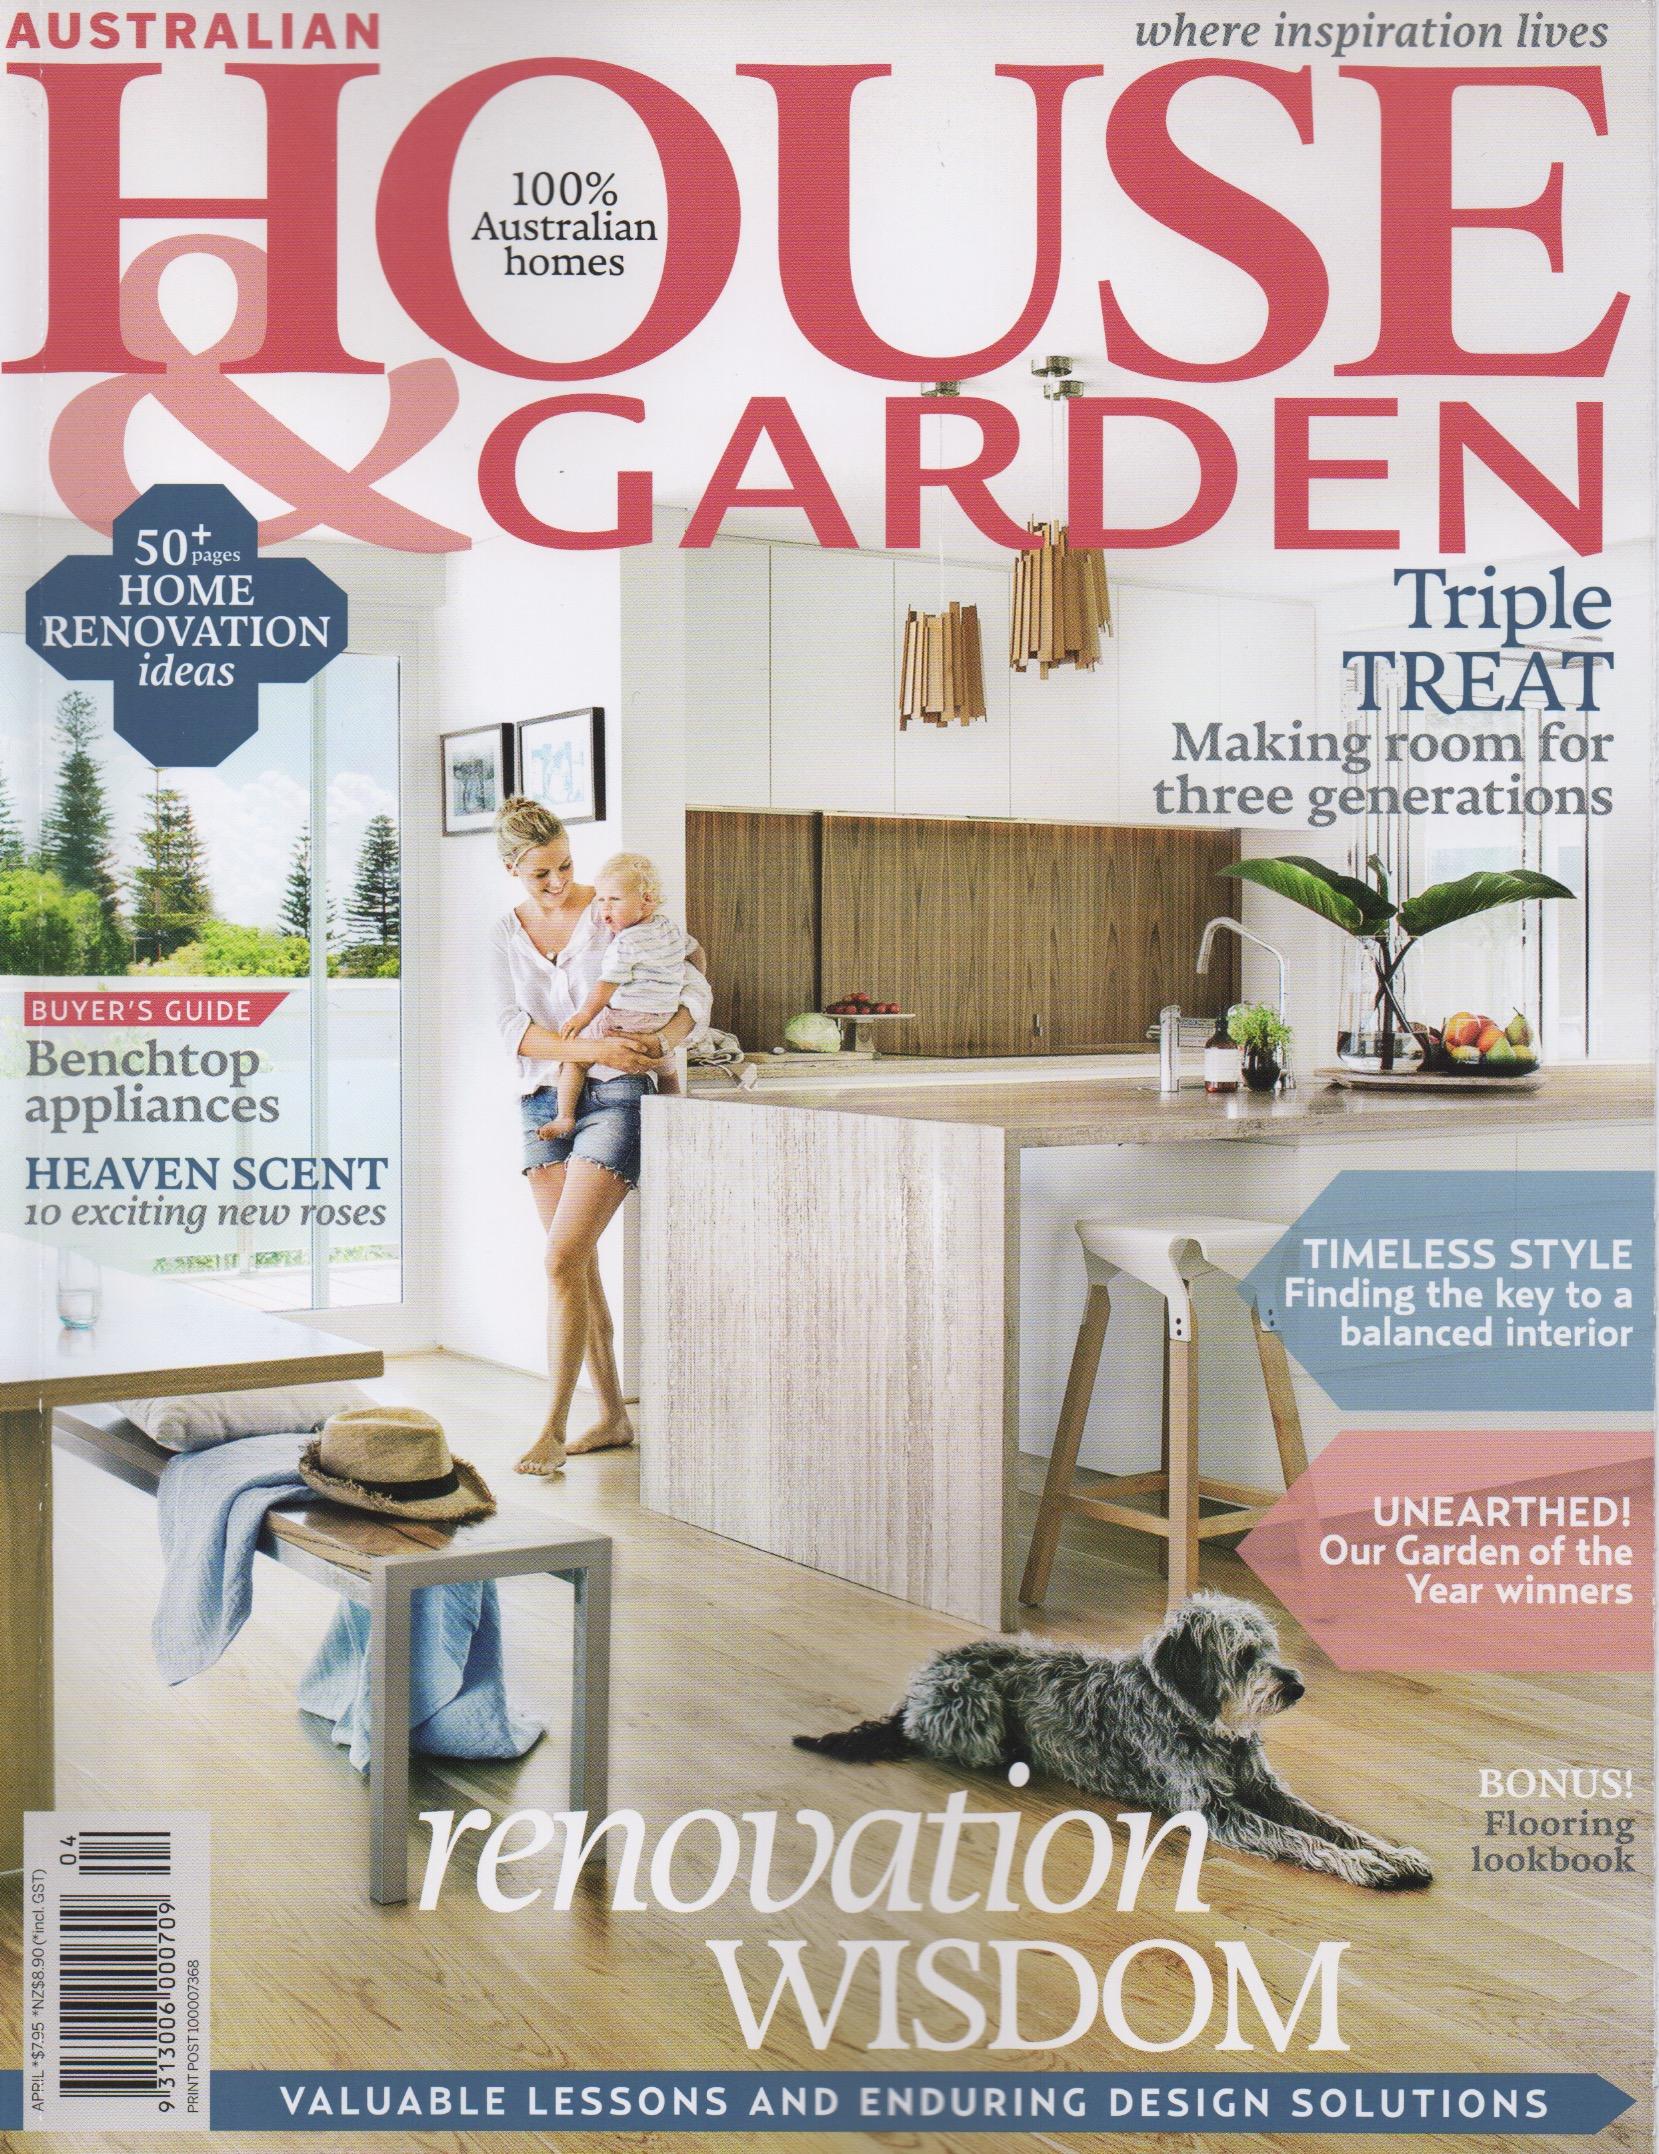 Ilanel - House & Garden - April - Cover.jpeg